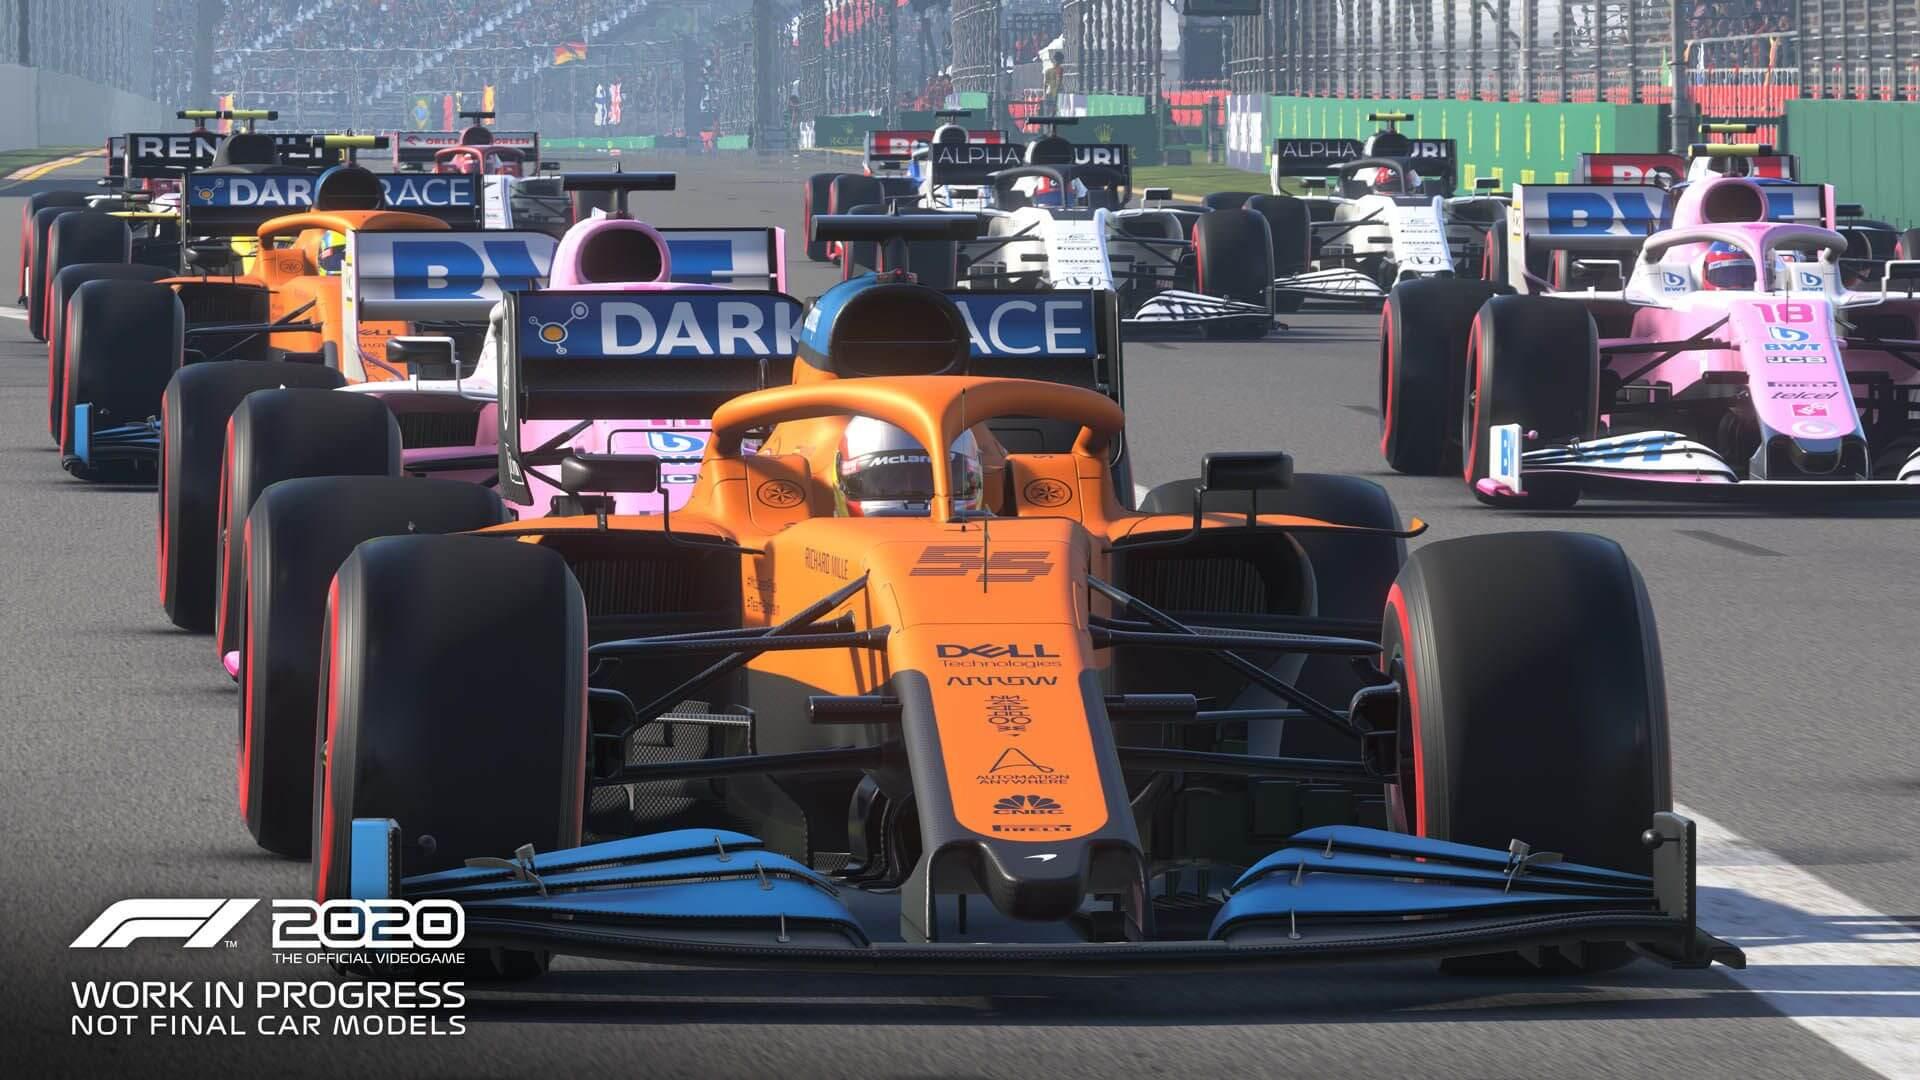 F1 2020 header image 3